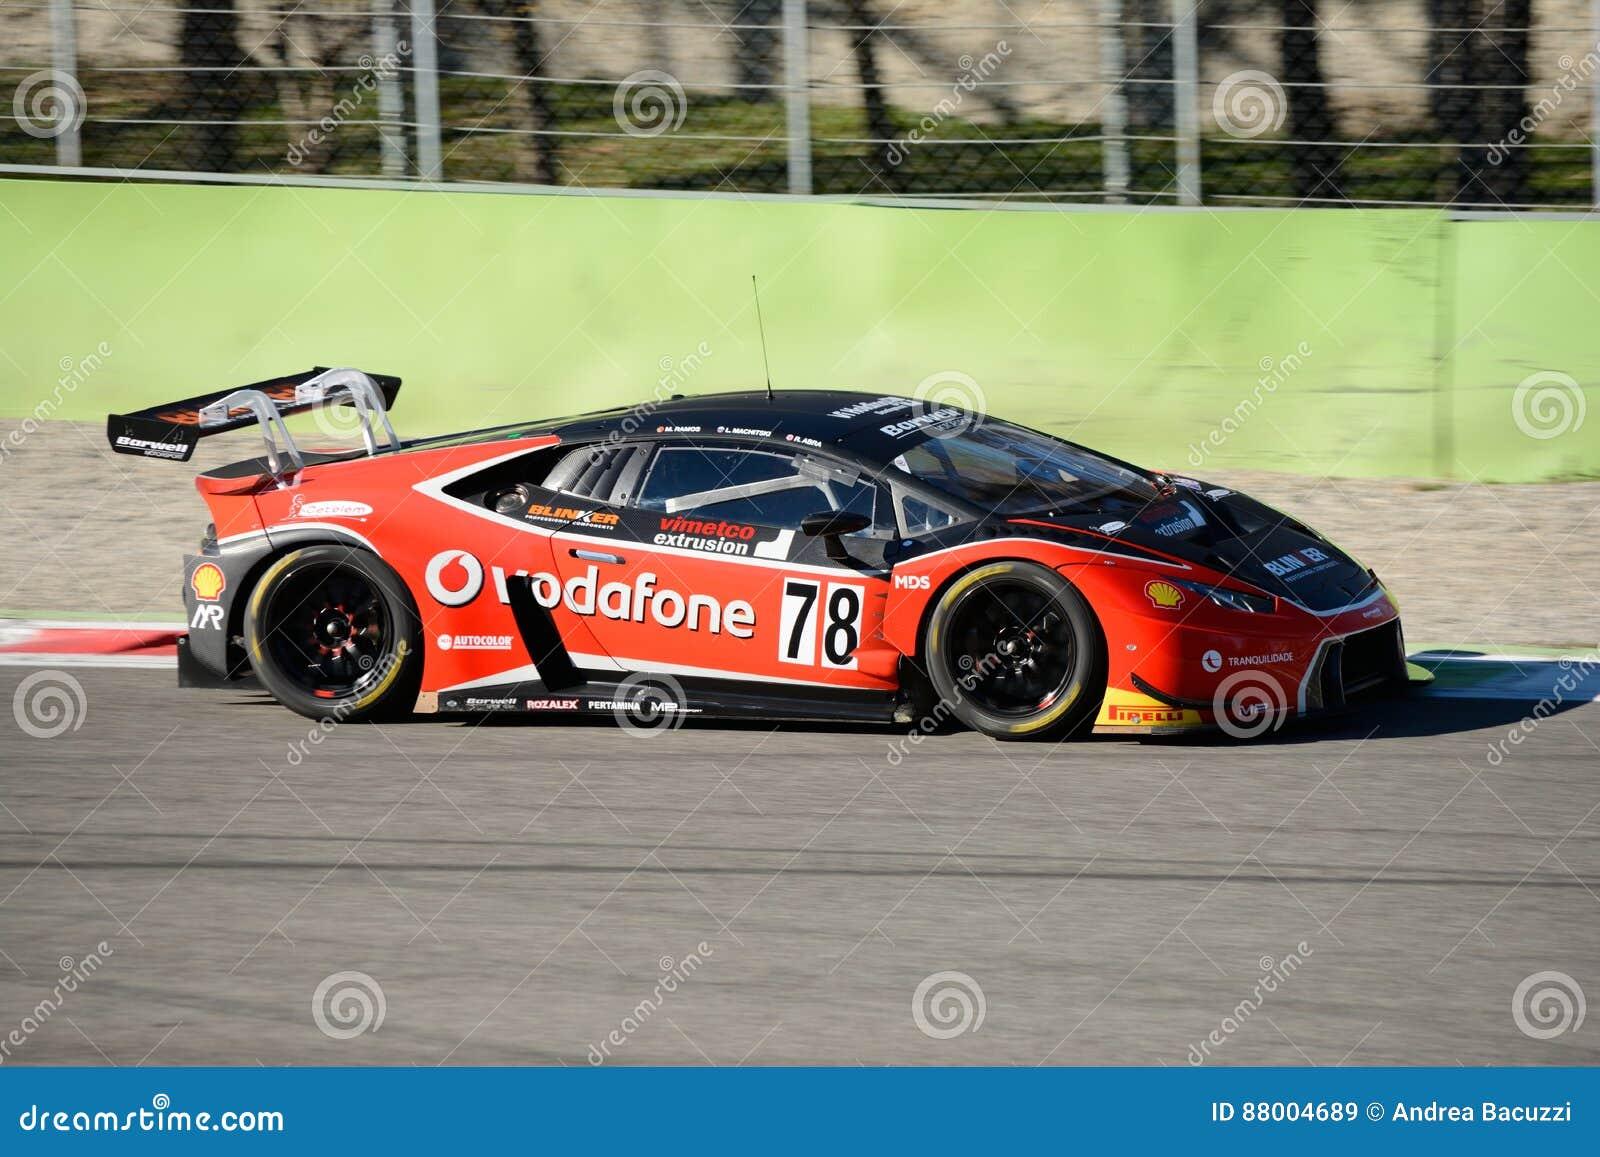 Lamborghini Huracan Gt3 Racing Car At Monza Editorial Stock Image